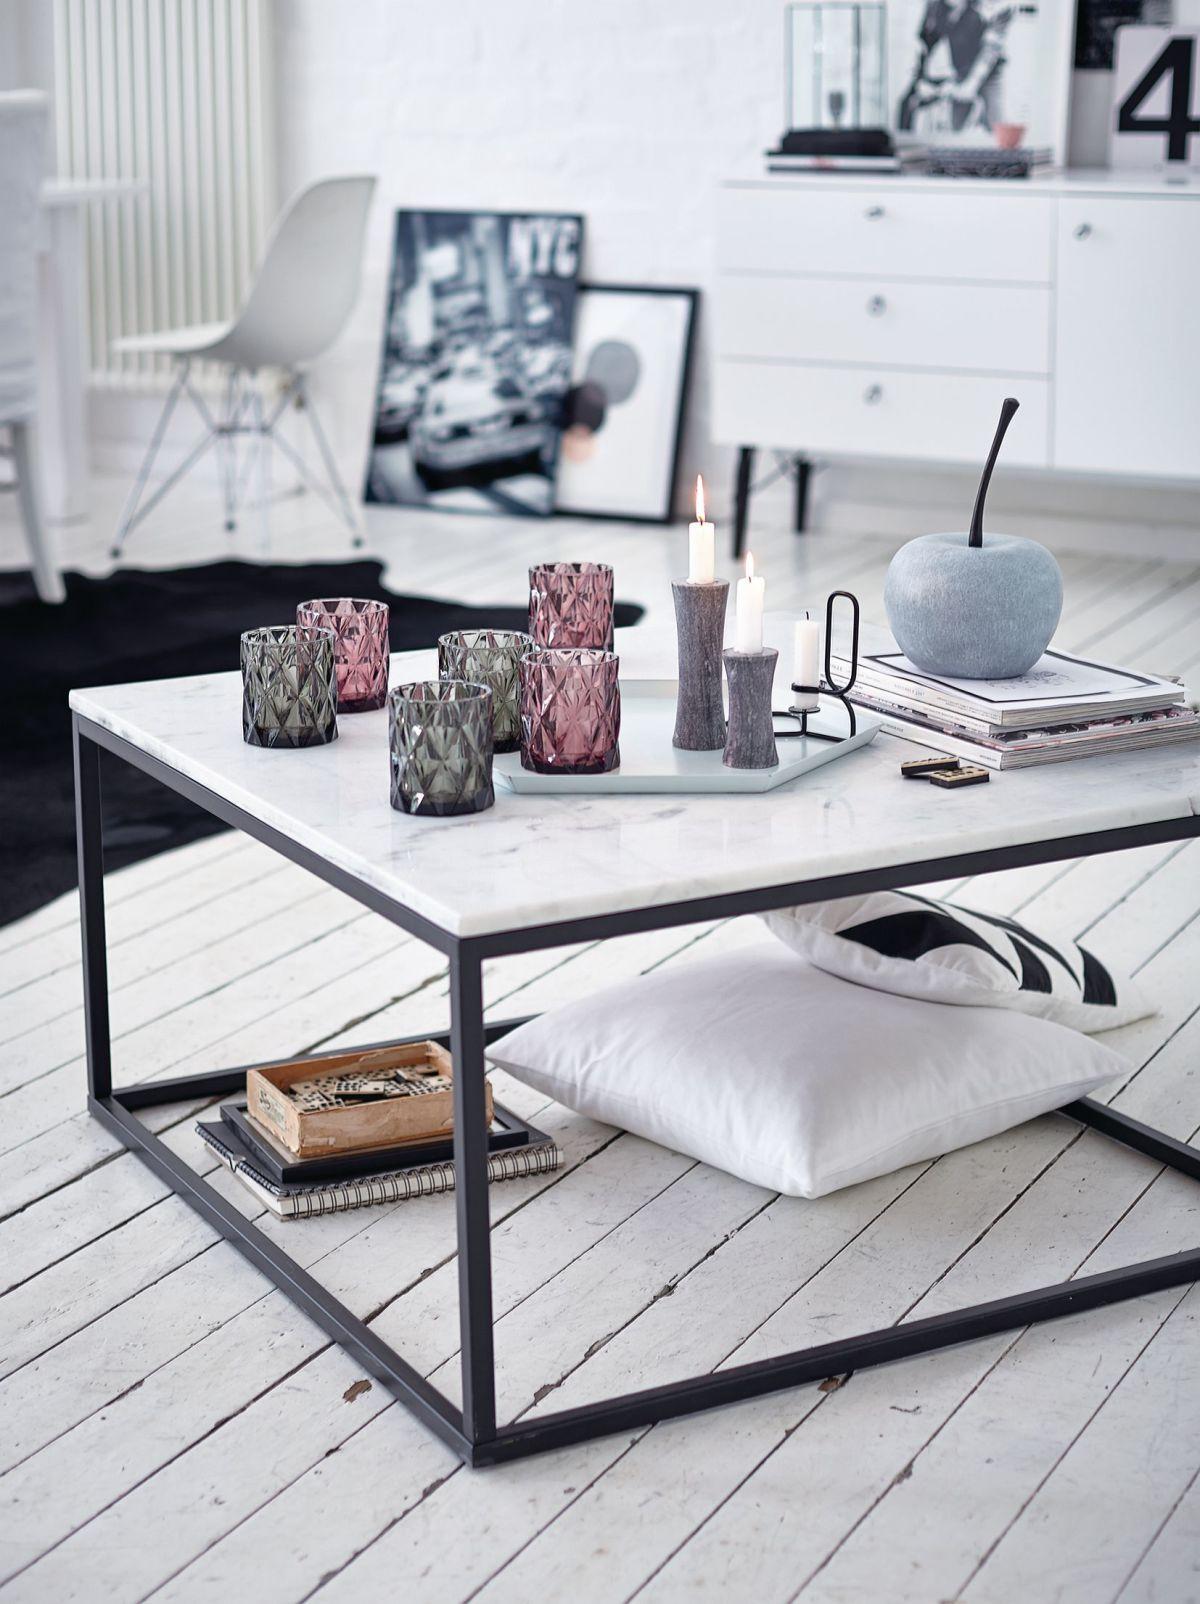 Couchtisch, Quadratisch, Modern, Marmor, Metall | Couchtische | Tische |  Möbel |